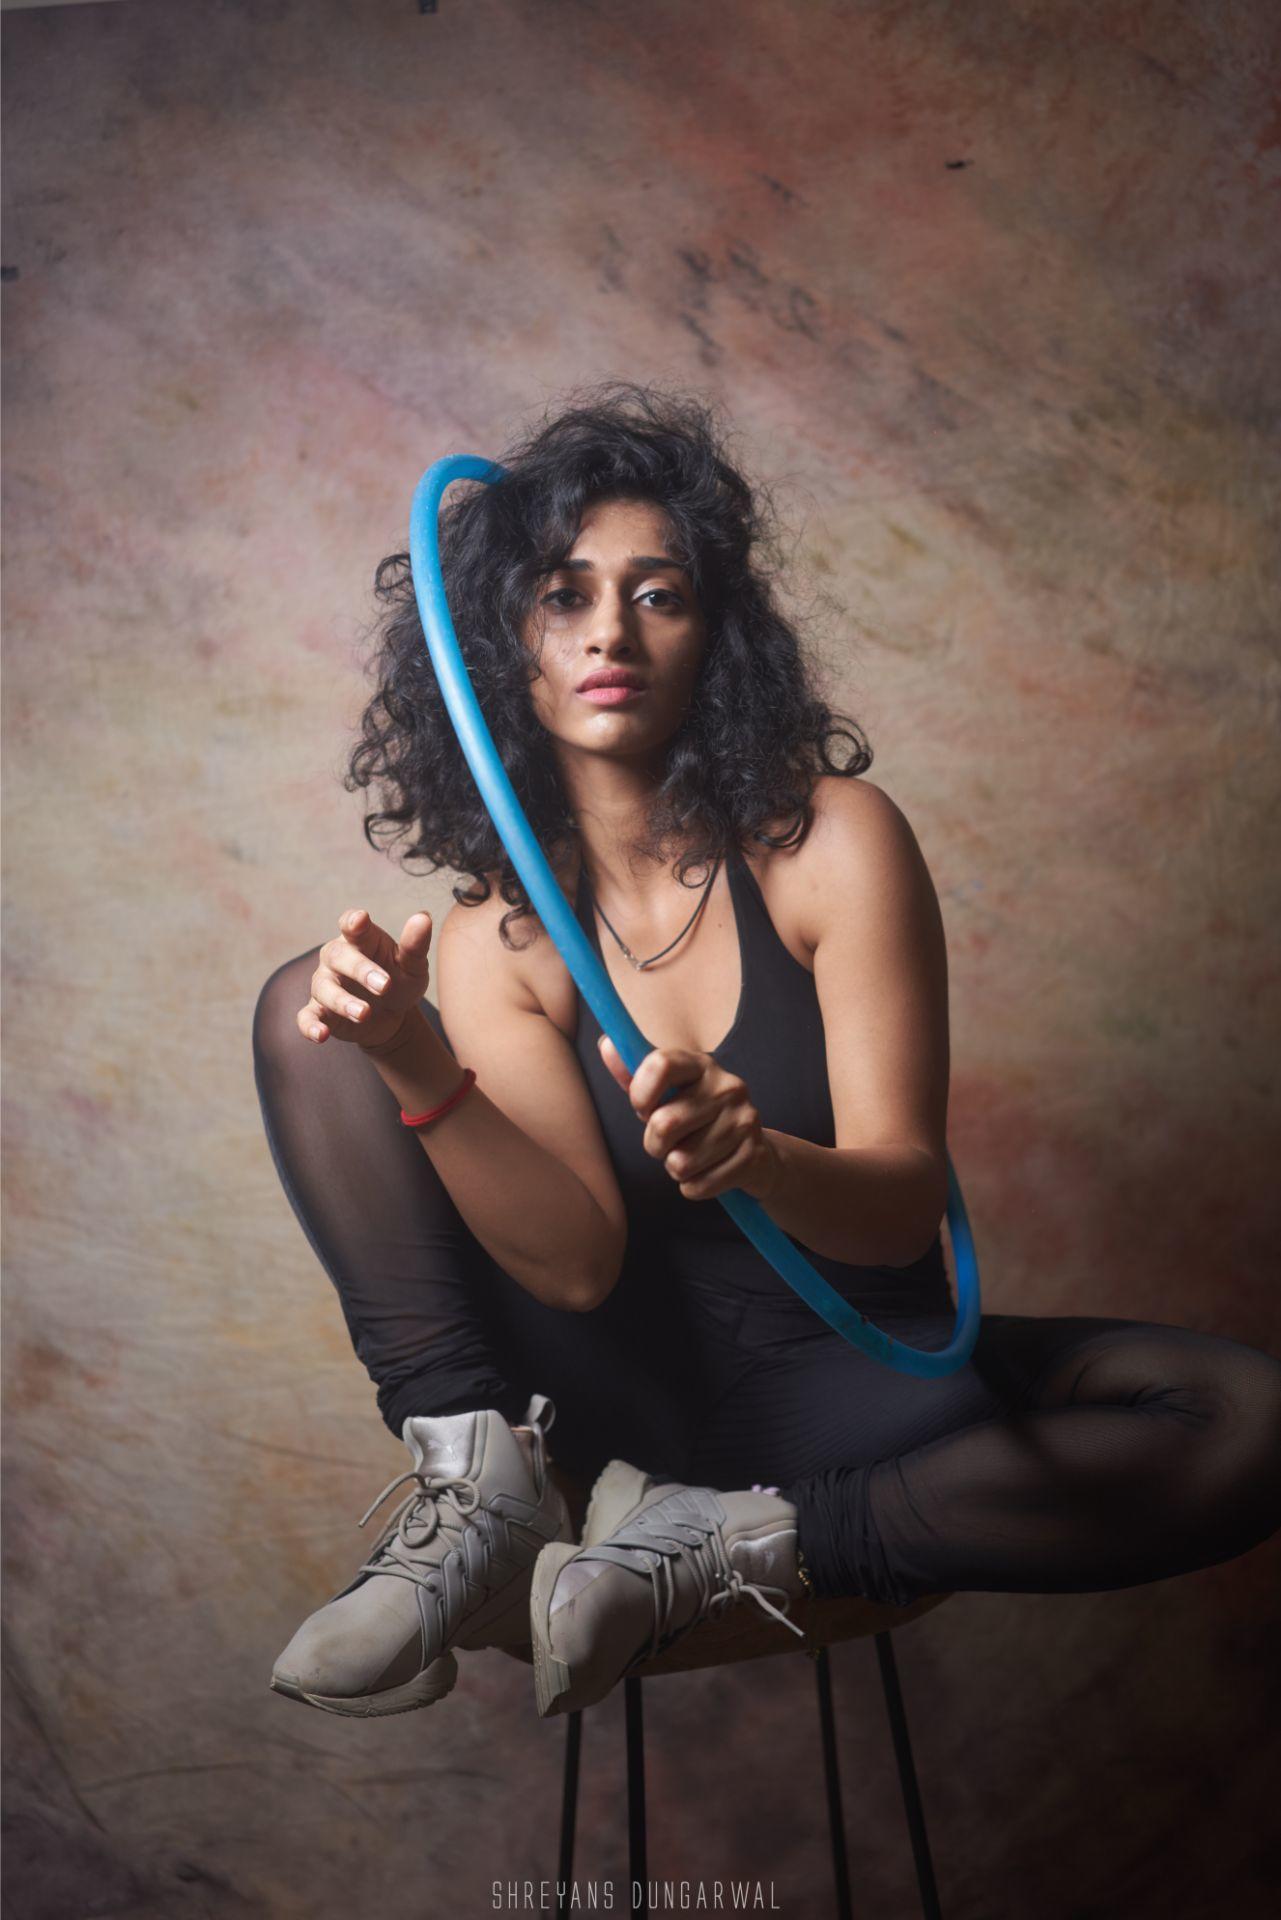 Posing with hula hoop attitude wearing black model